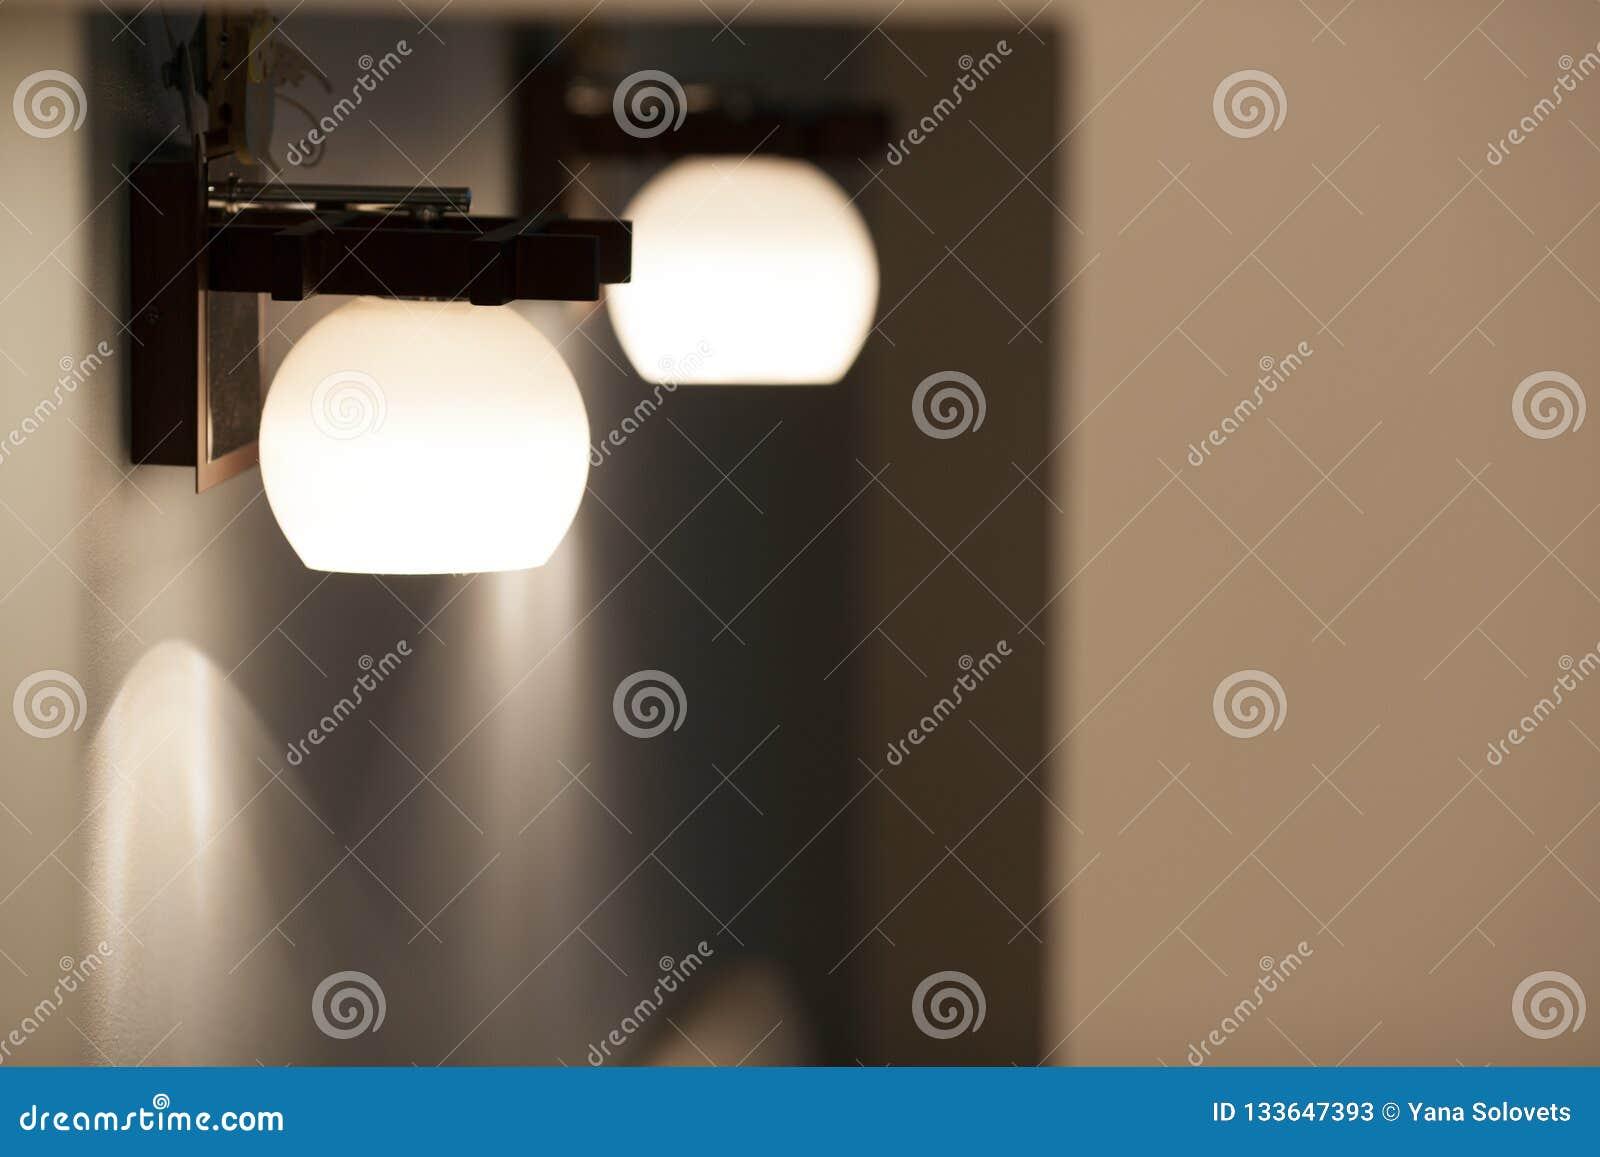 Lâmpadas de parede com máscara branca